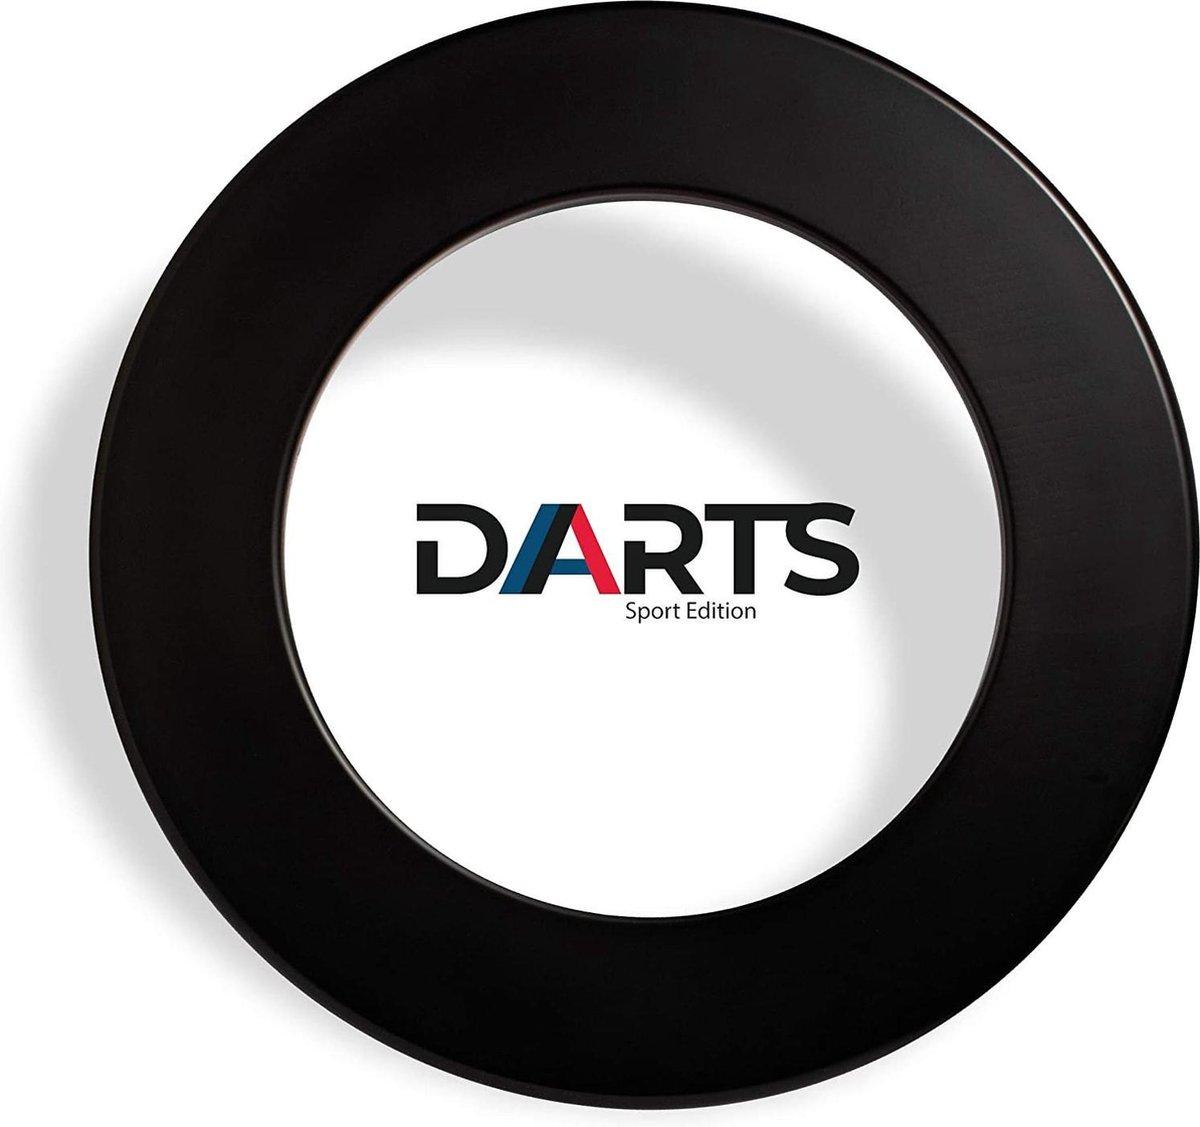 Dartbord Surround Ring - Zinaps Dartboard Surround Black-(wk 02127)